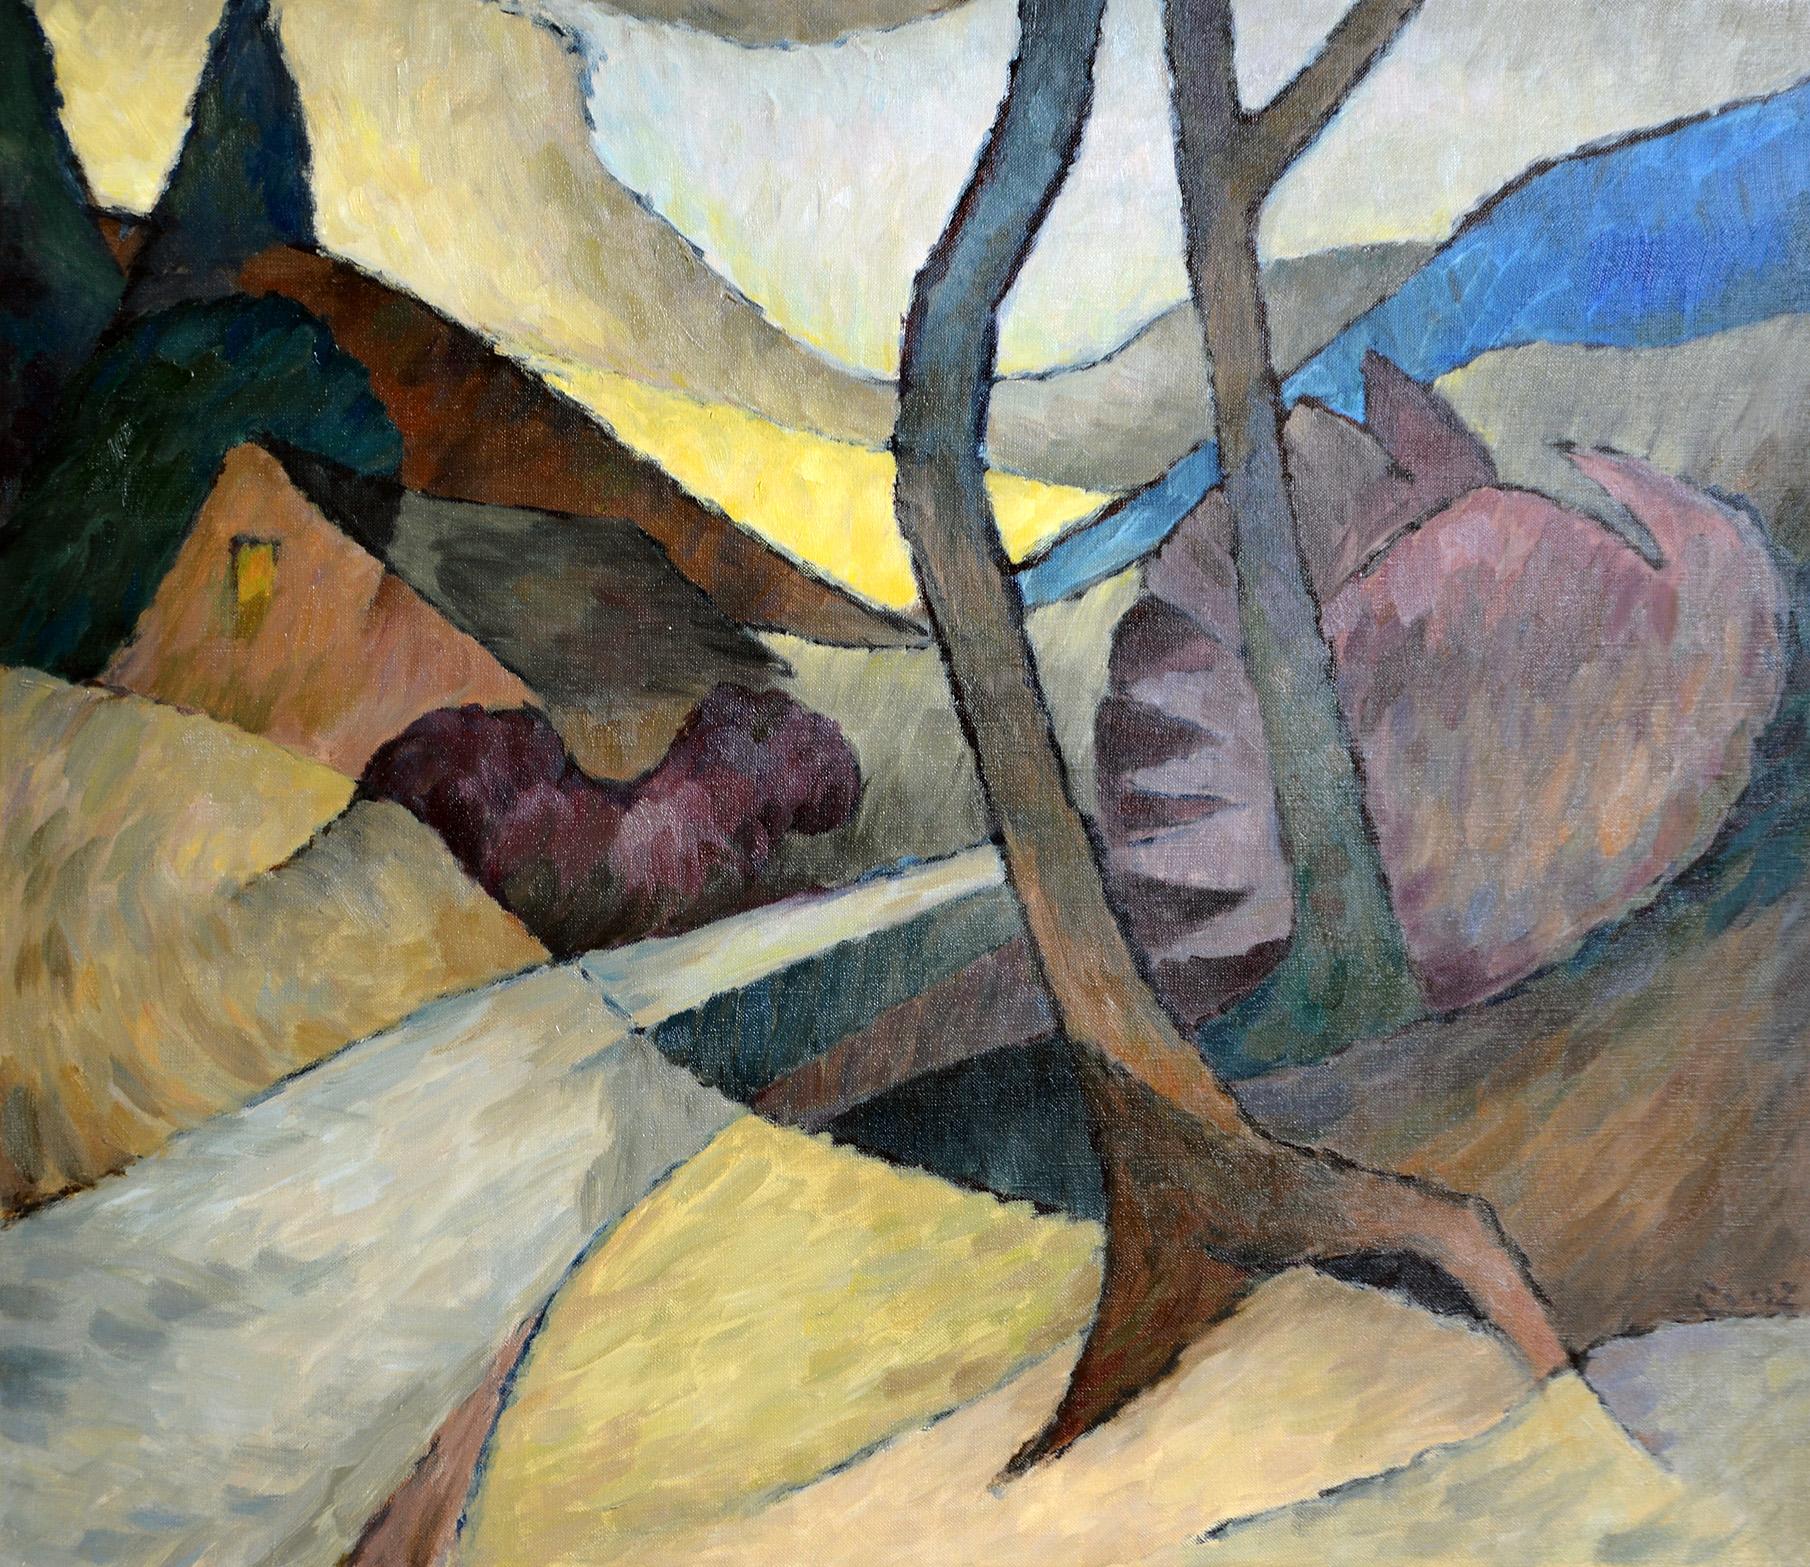 November - Strasse - grau/gelb/purpur, 1984. Öl auf Leinwand. 70 x 80cm